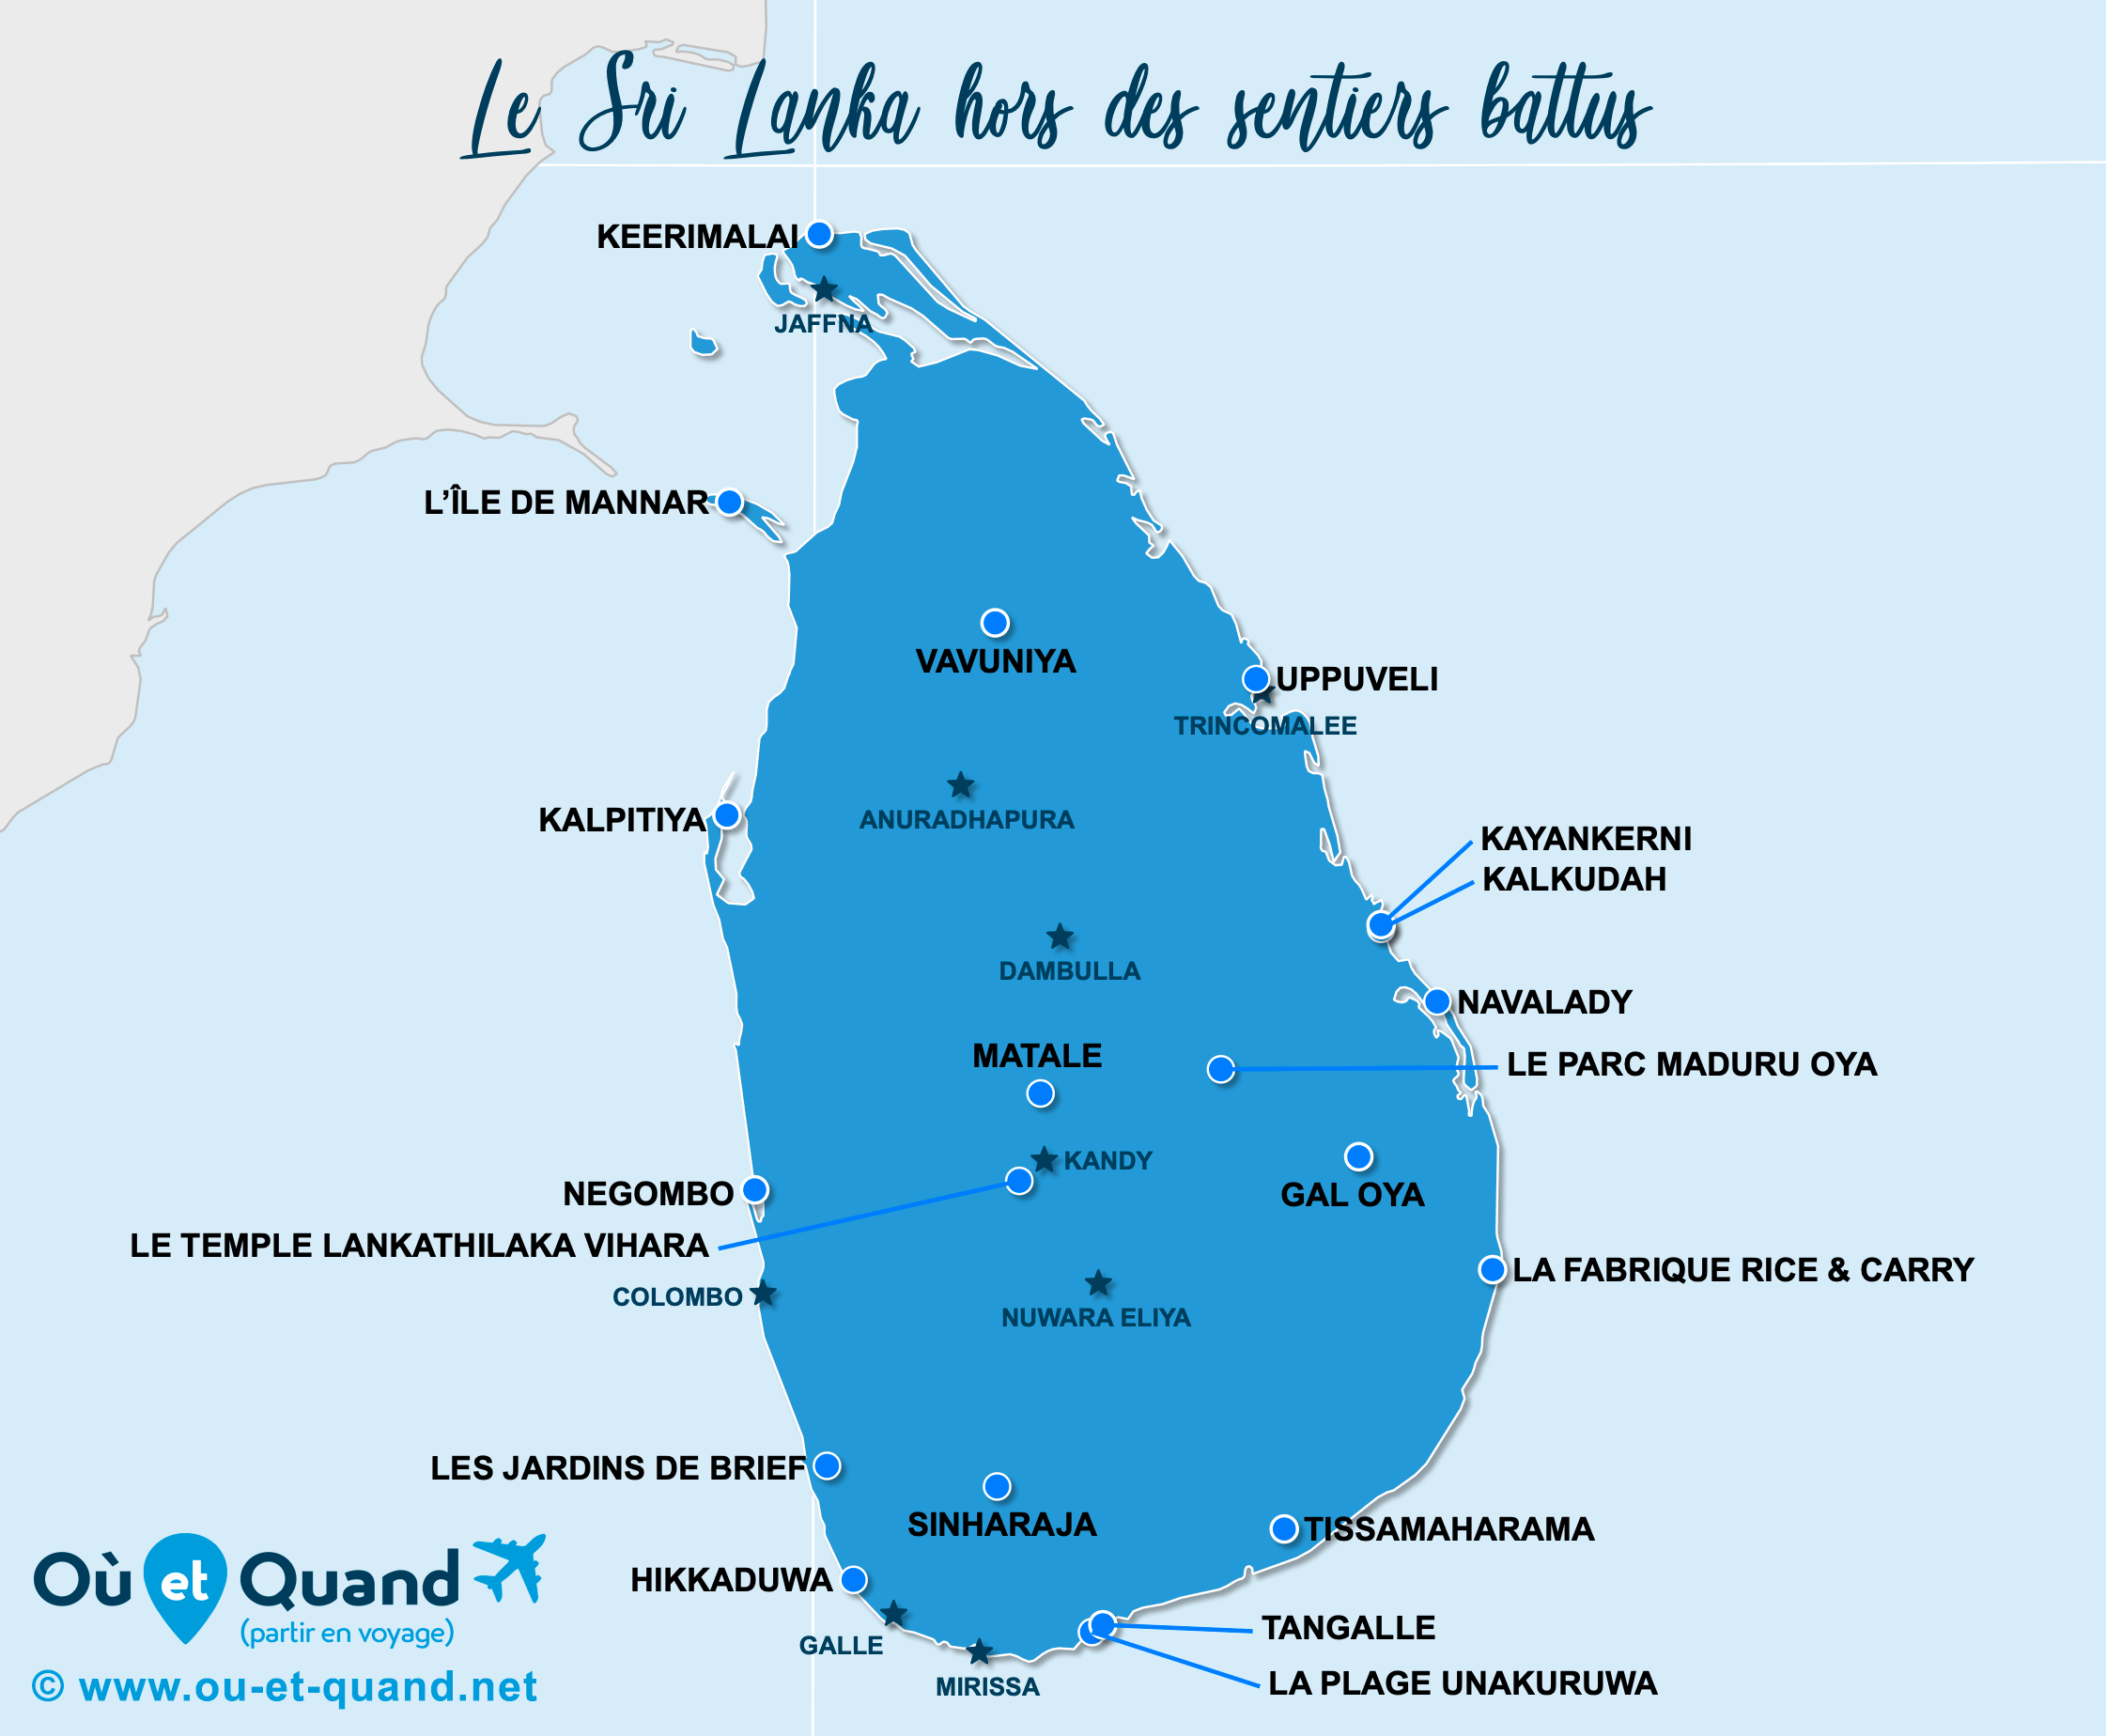 Carte Sri Lanka : Le Sri Lanka hors des sentiers battus